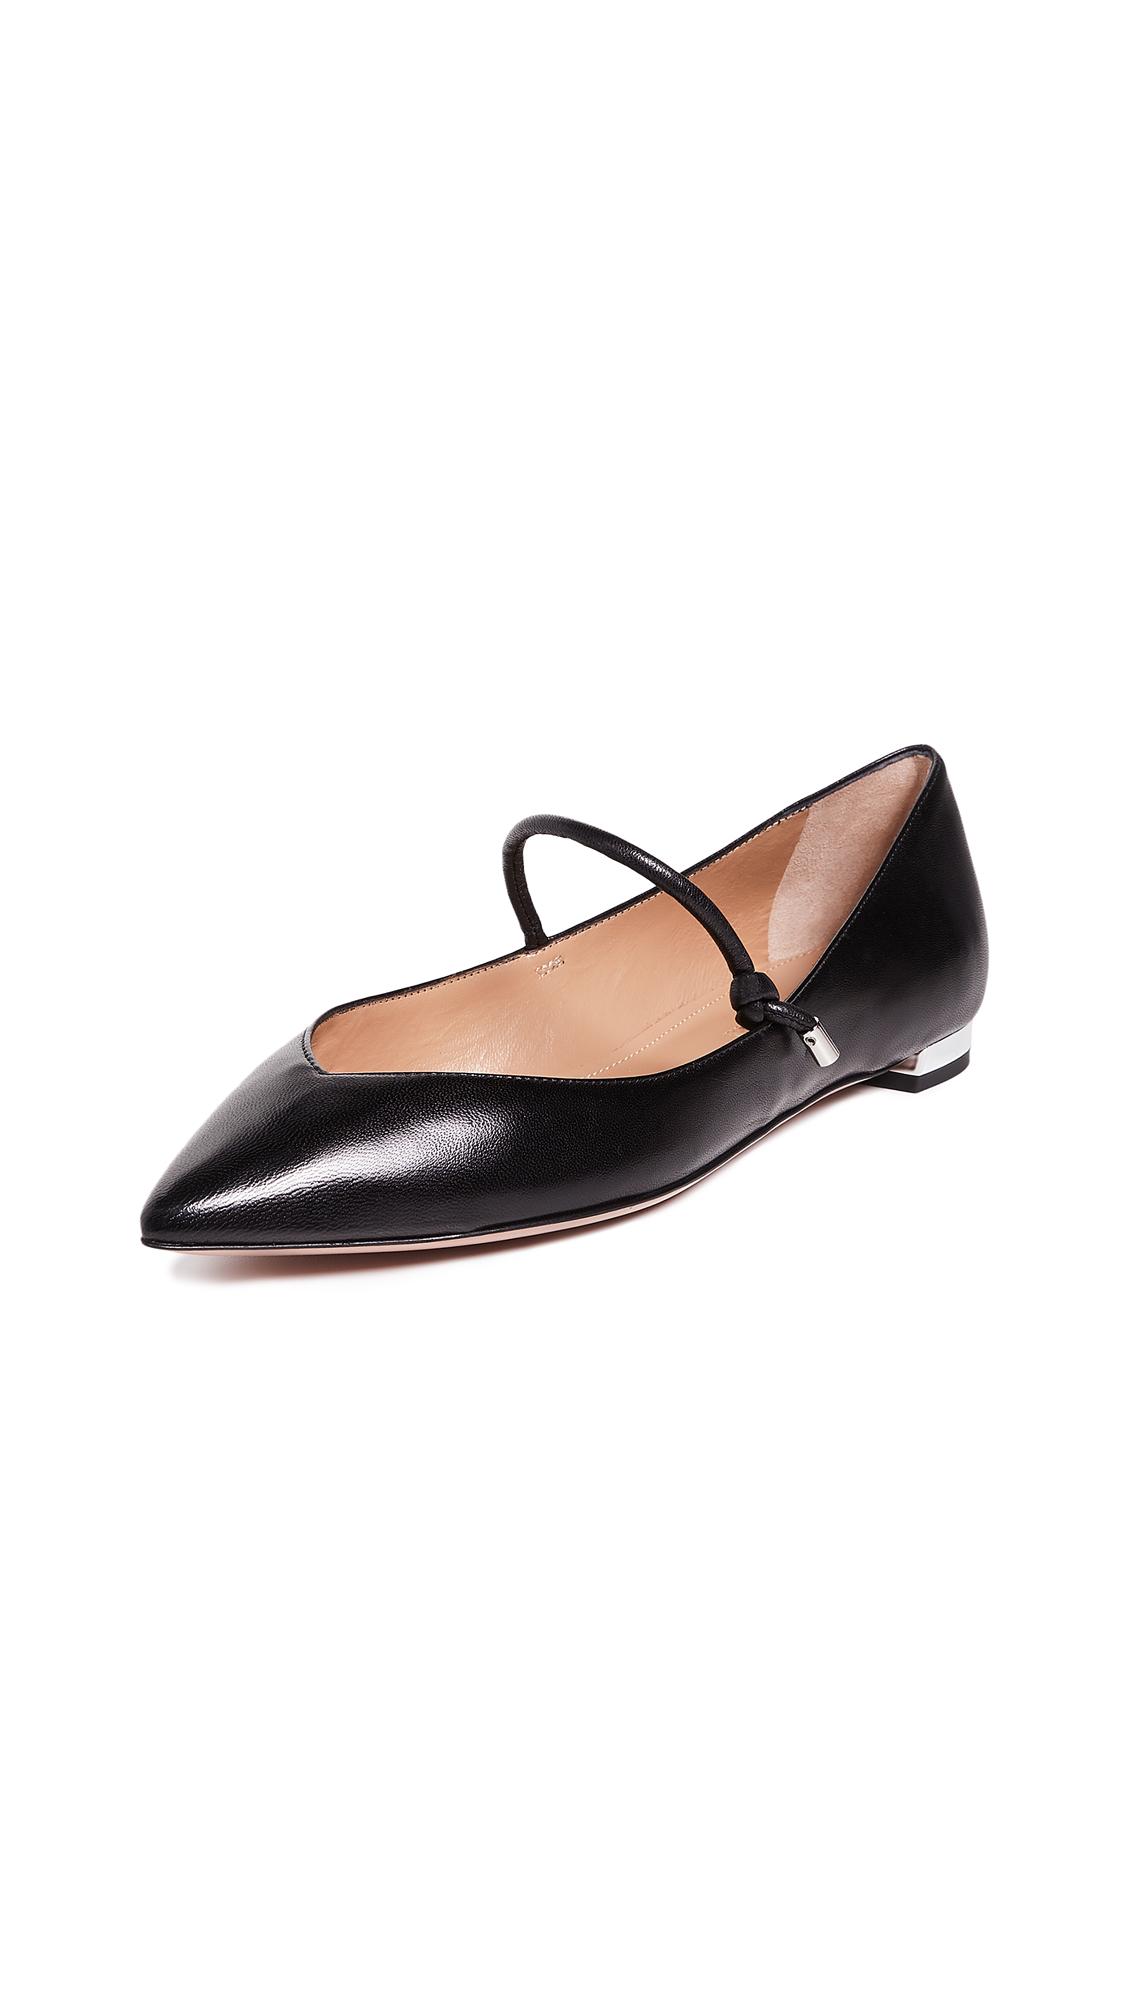 Aquazzura Stylist Ballet Flats - Black